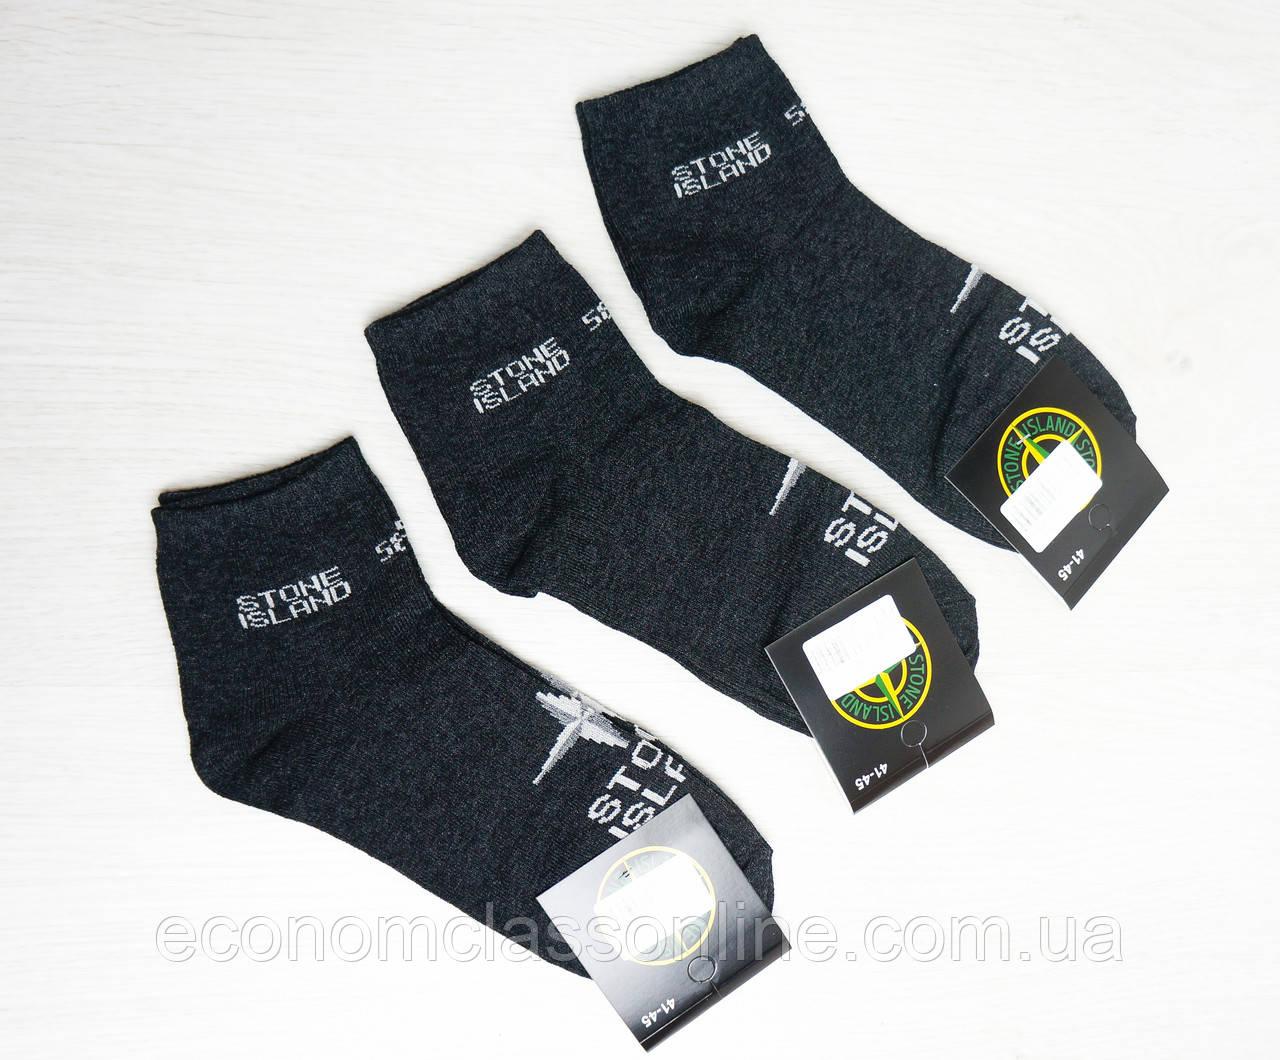 Мужские серые носки средние Stone Island (41-45р)